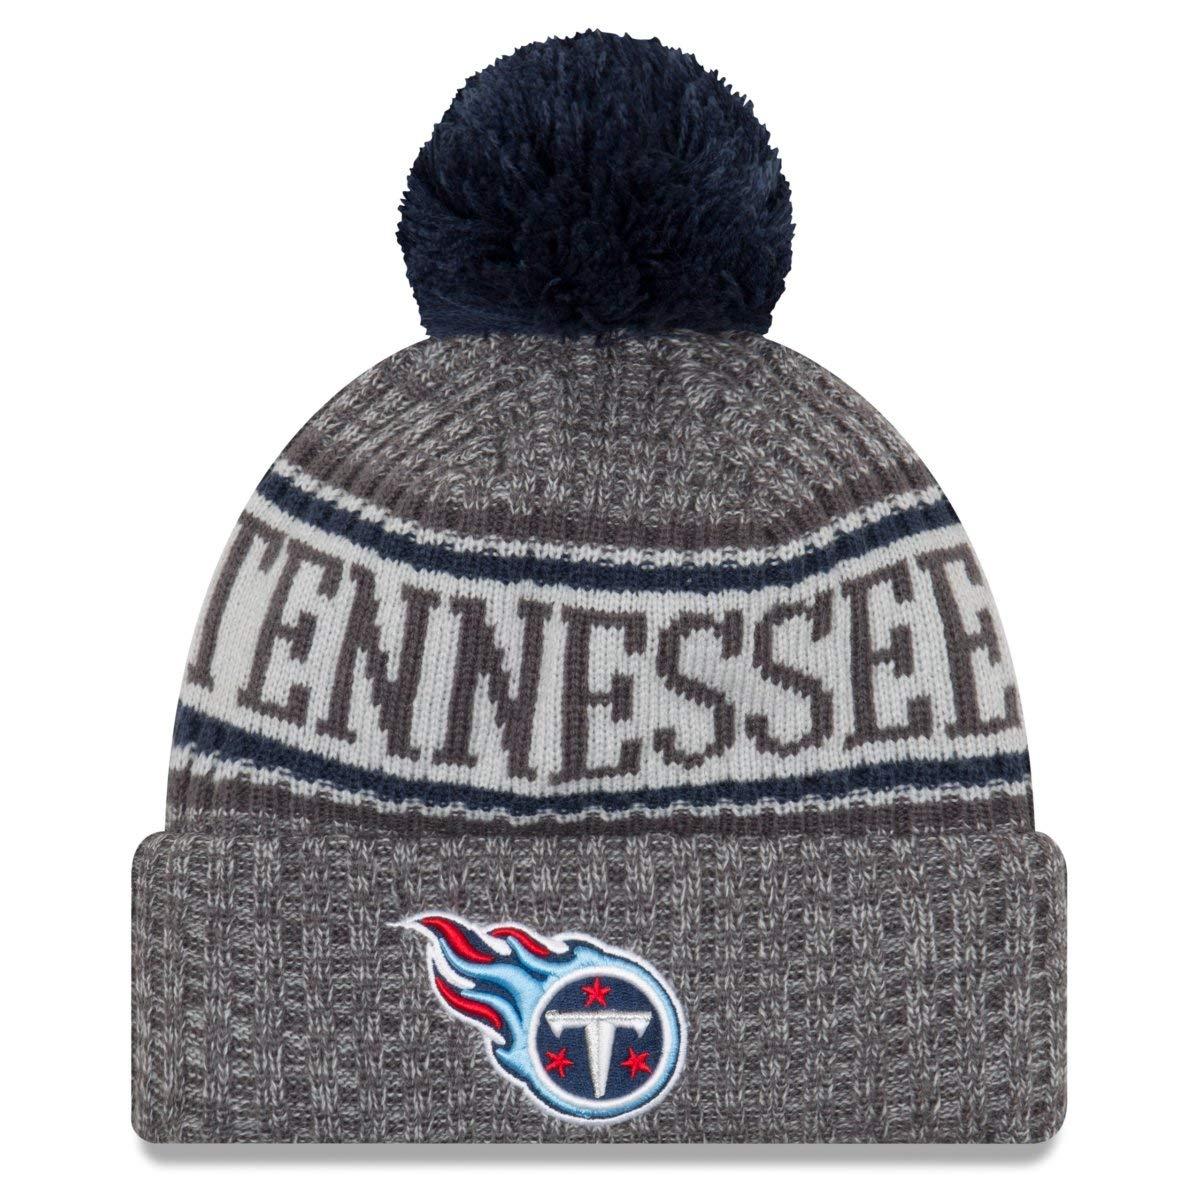 4b94eb835fc834 New Era NFL Tennessee Titans 2018 Sideline Graphite Sport Knit:  Amazon.co.uk: Sports & Outdoors